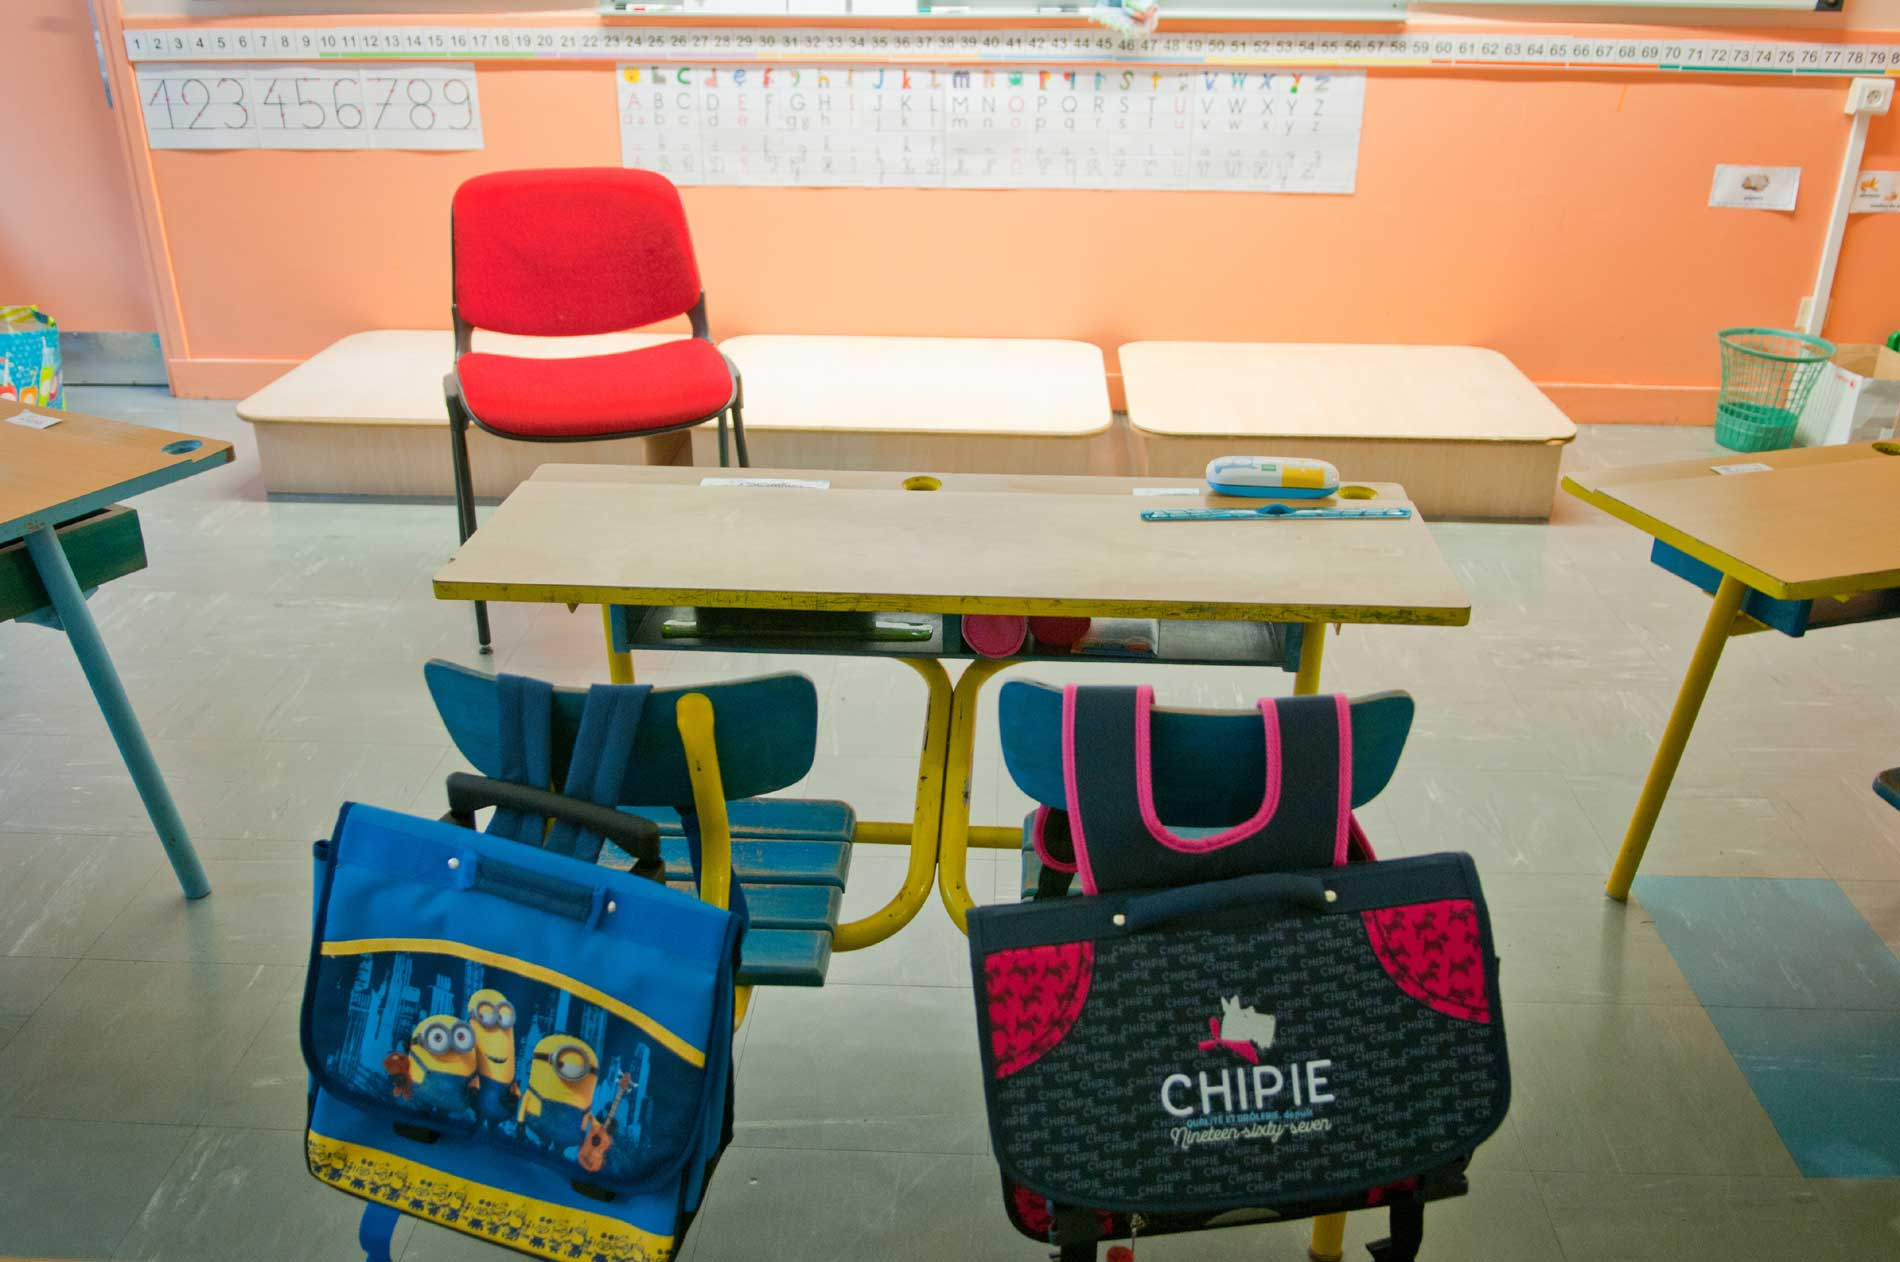 Salle de classe à Kersabiec